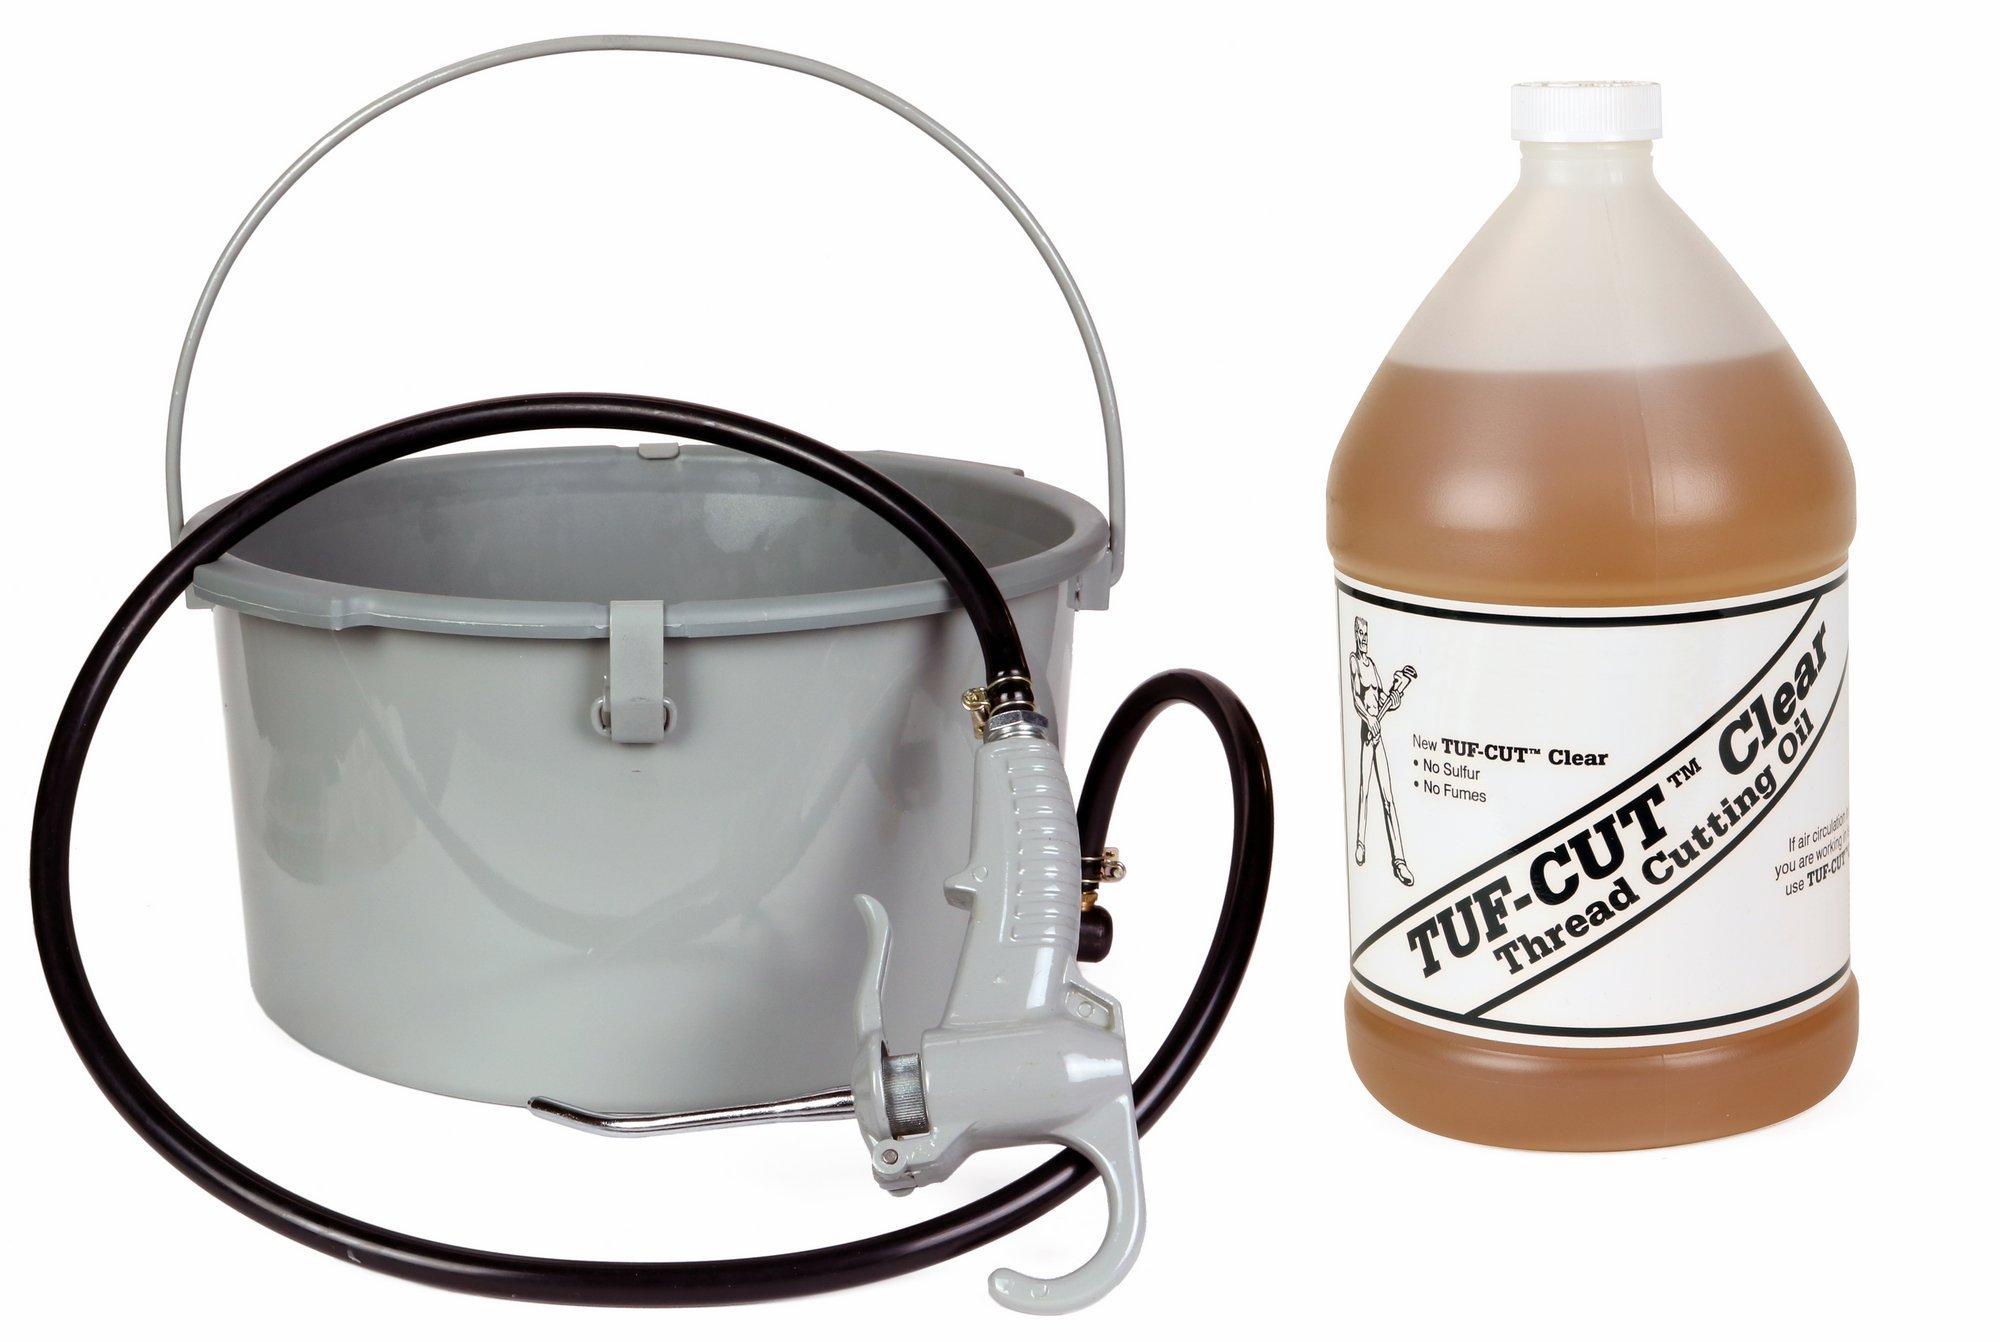 Toledo Pipe 418 Oiler 10883 & 1 Gallon of Tuf-Cut Clear Oil fits RIDGID 300 535 700 12R 690 Pipe Threading Machine